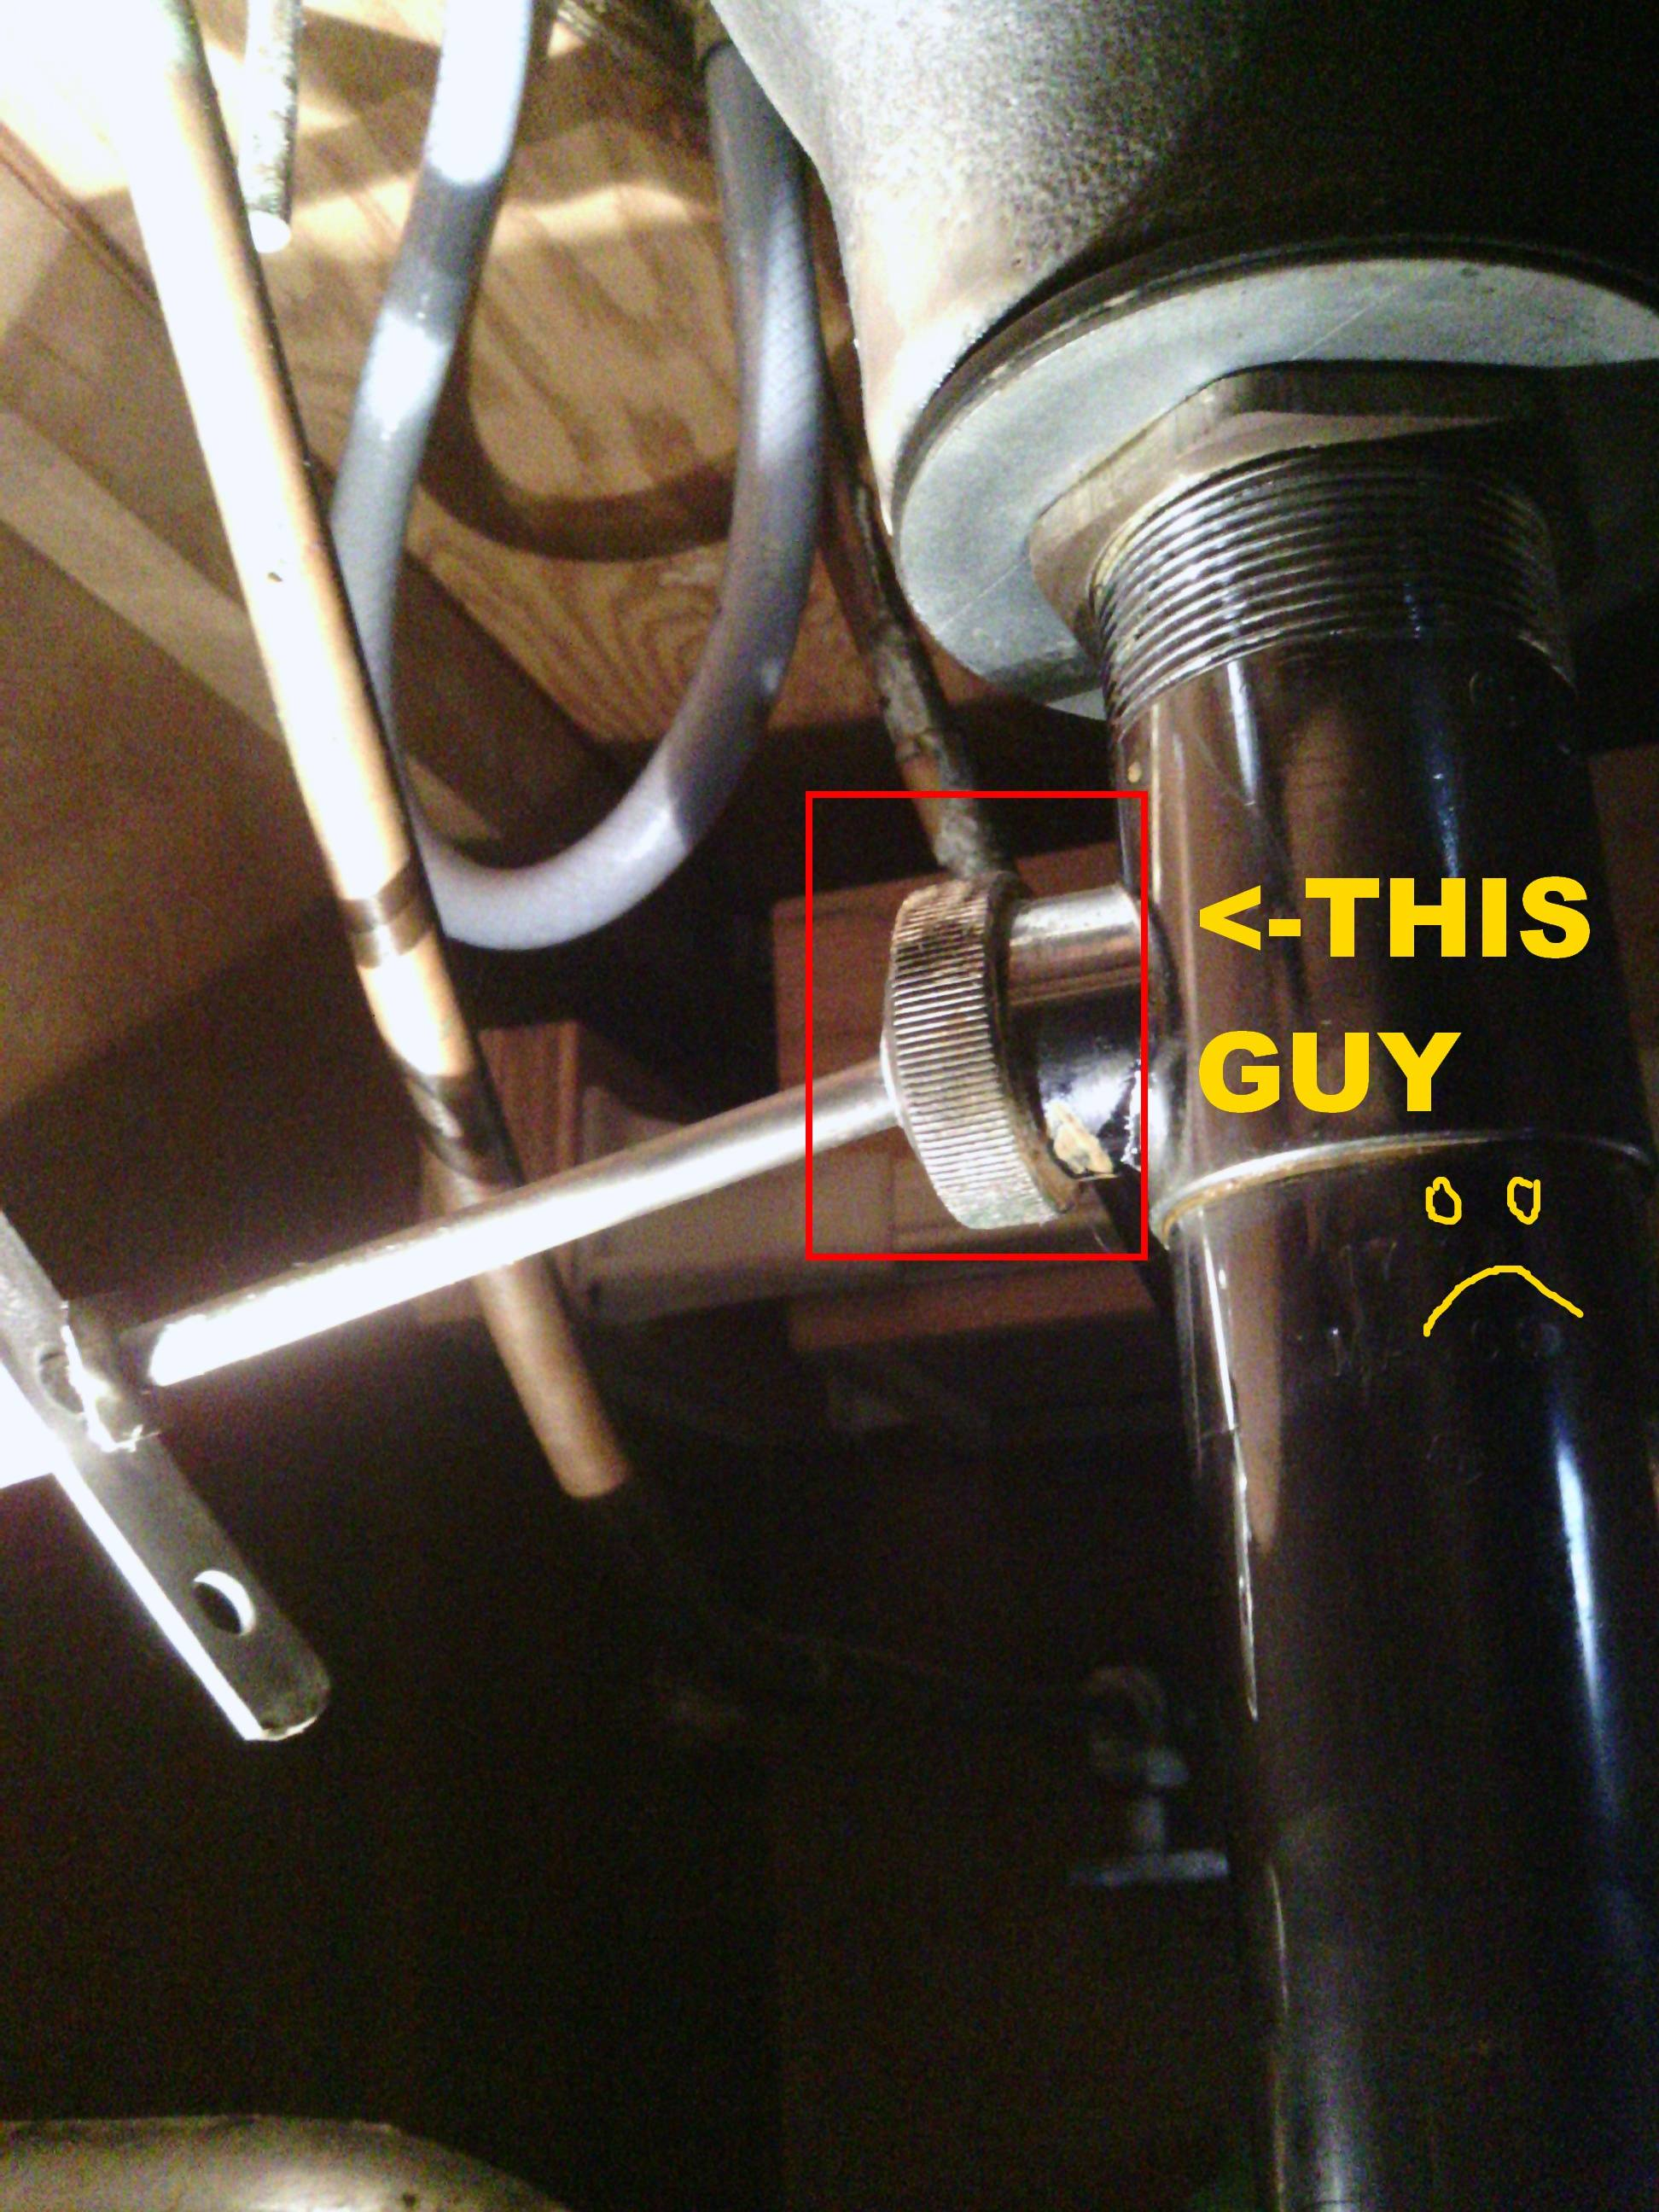 plumbing  How do I loosen my bathroom stopper pivot nut  Home Improvement Stack Exchange